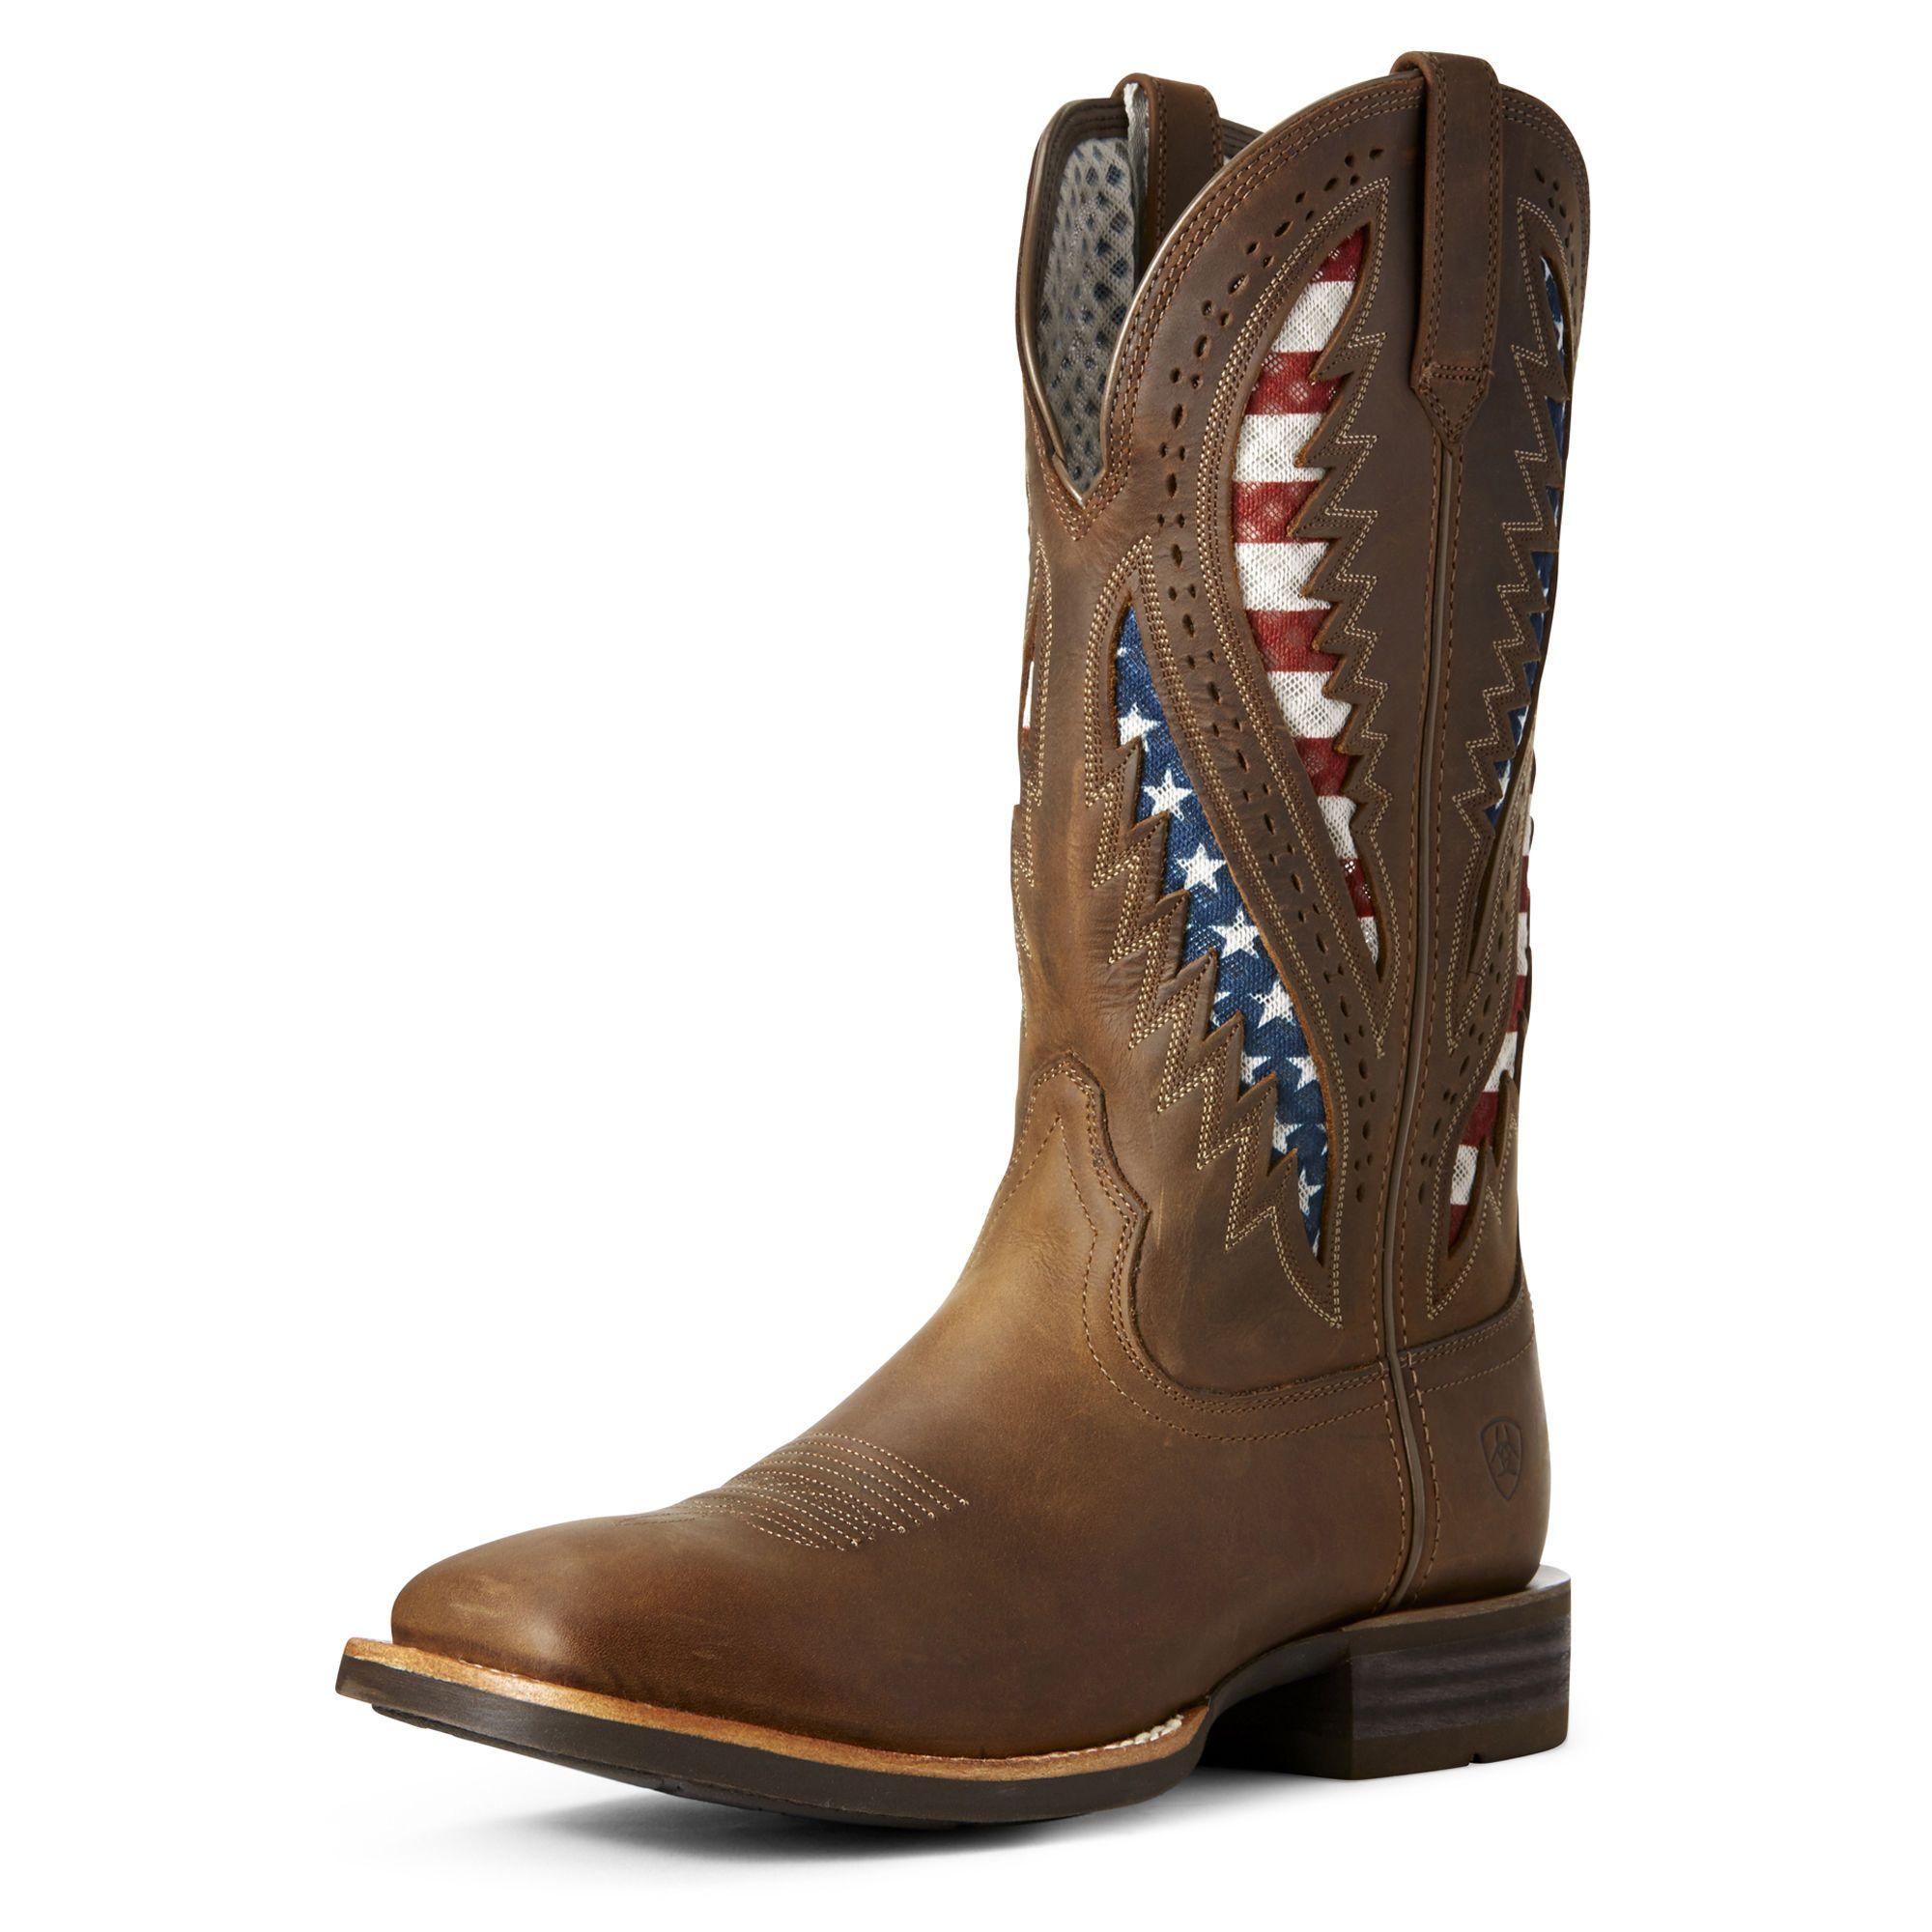 Men's Quickdraw VentTEK Western Boots in Distressed Brown, size 8.5 D / Medium by Ariat